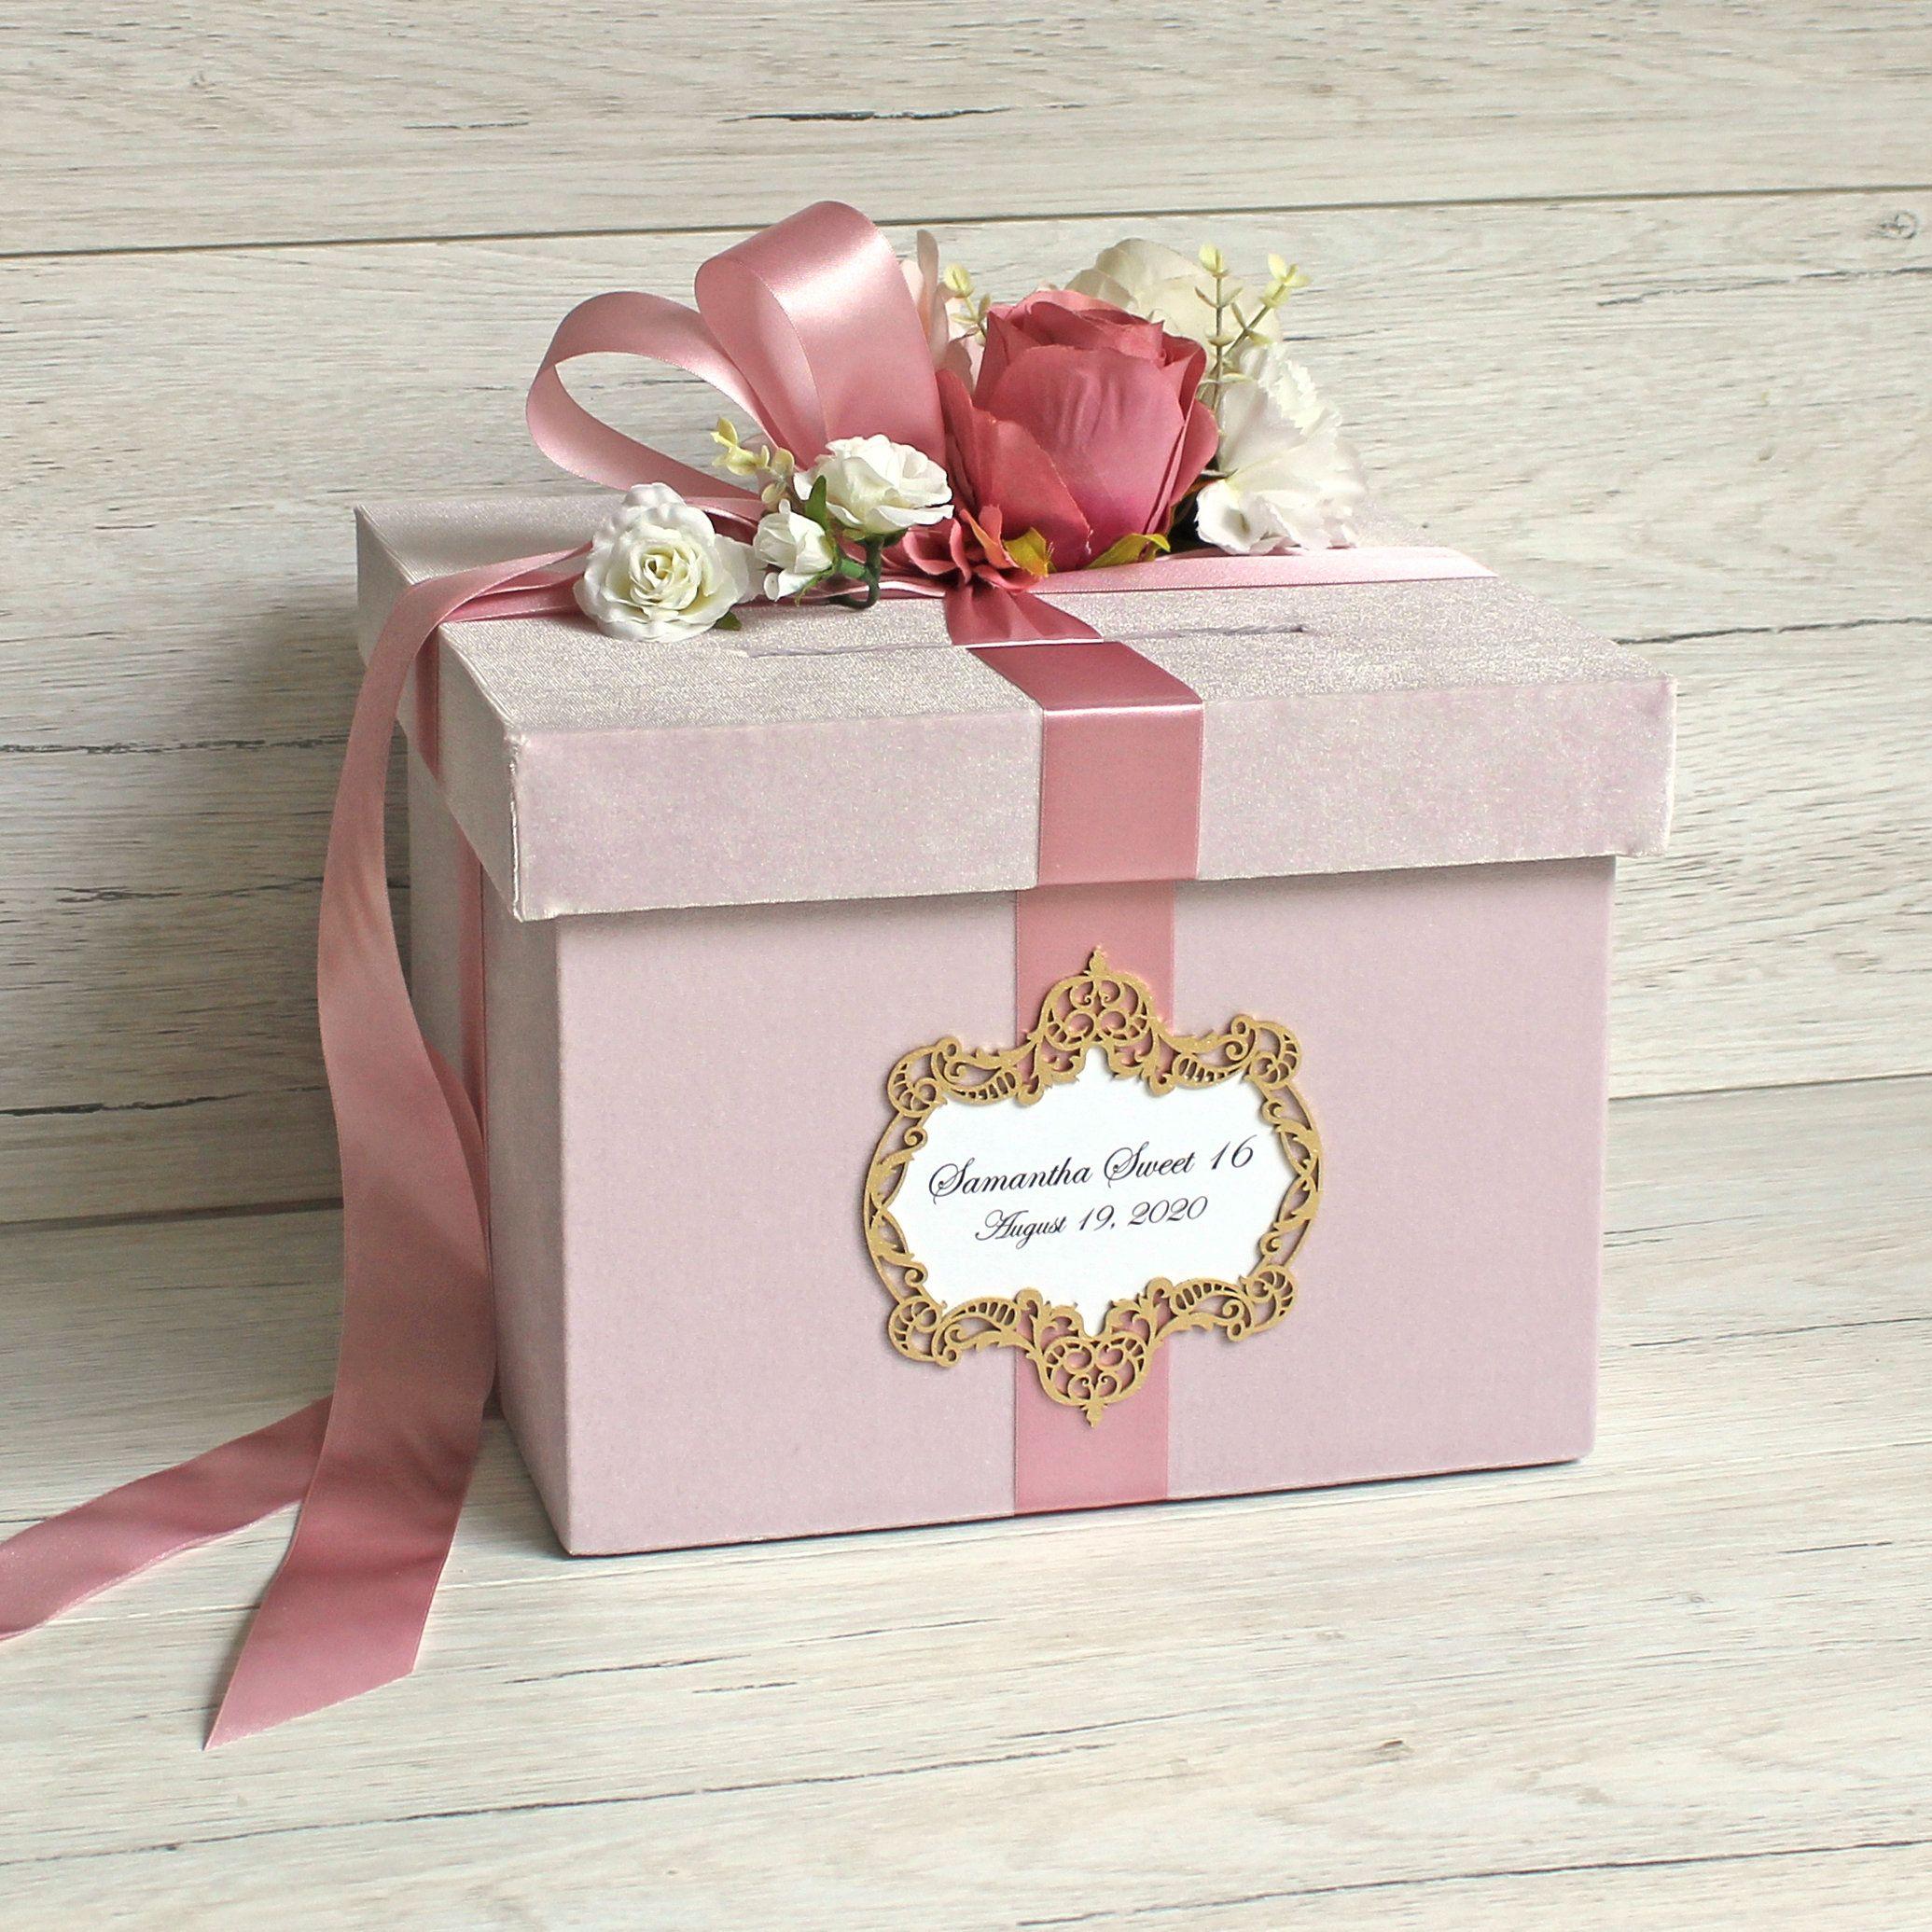 Personalized Card Box For Wedding Custom Wedding Card Holder Large Dusty Pink Velvet Card Box With Slot In 2020 Card Box Wedding Custom Wedding Cards Money Box Wedding